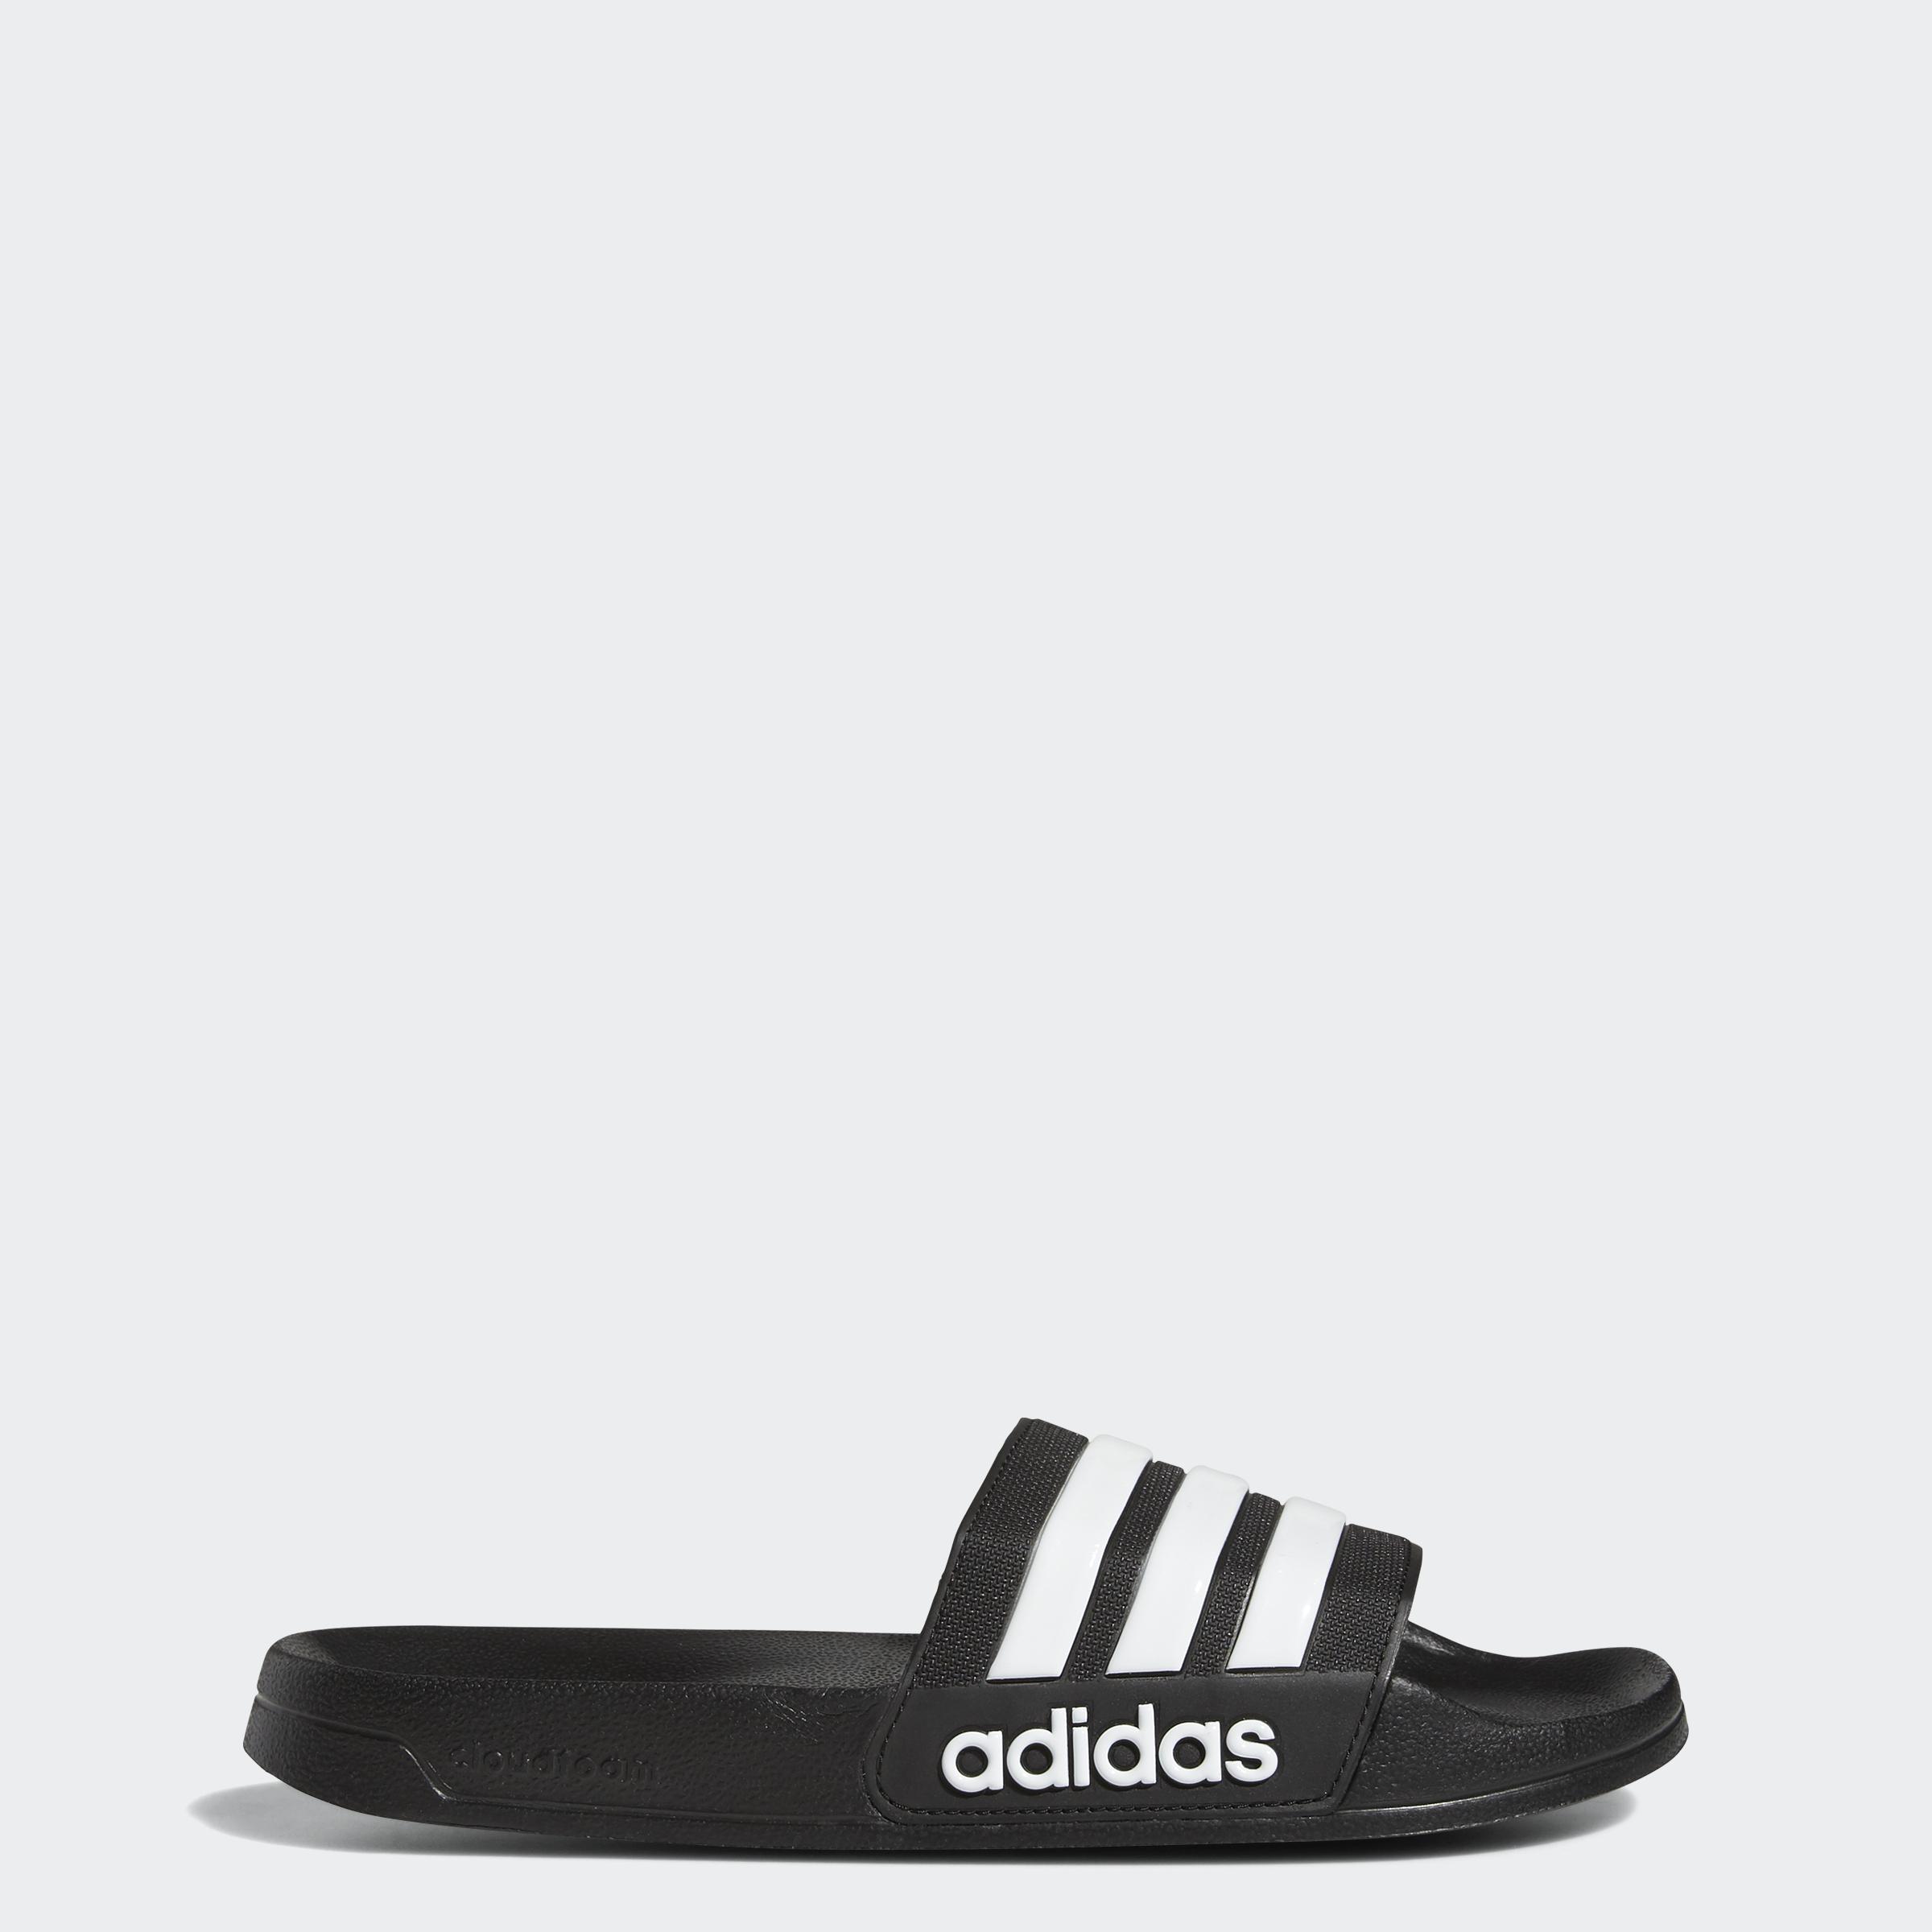 adidas-Adilette-Cloudfoam-Slides-Men-039-s thumbnail 10